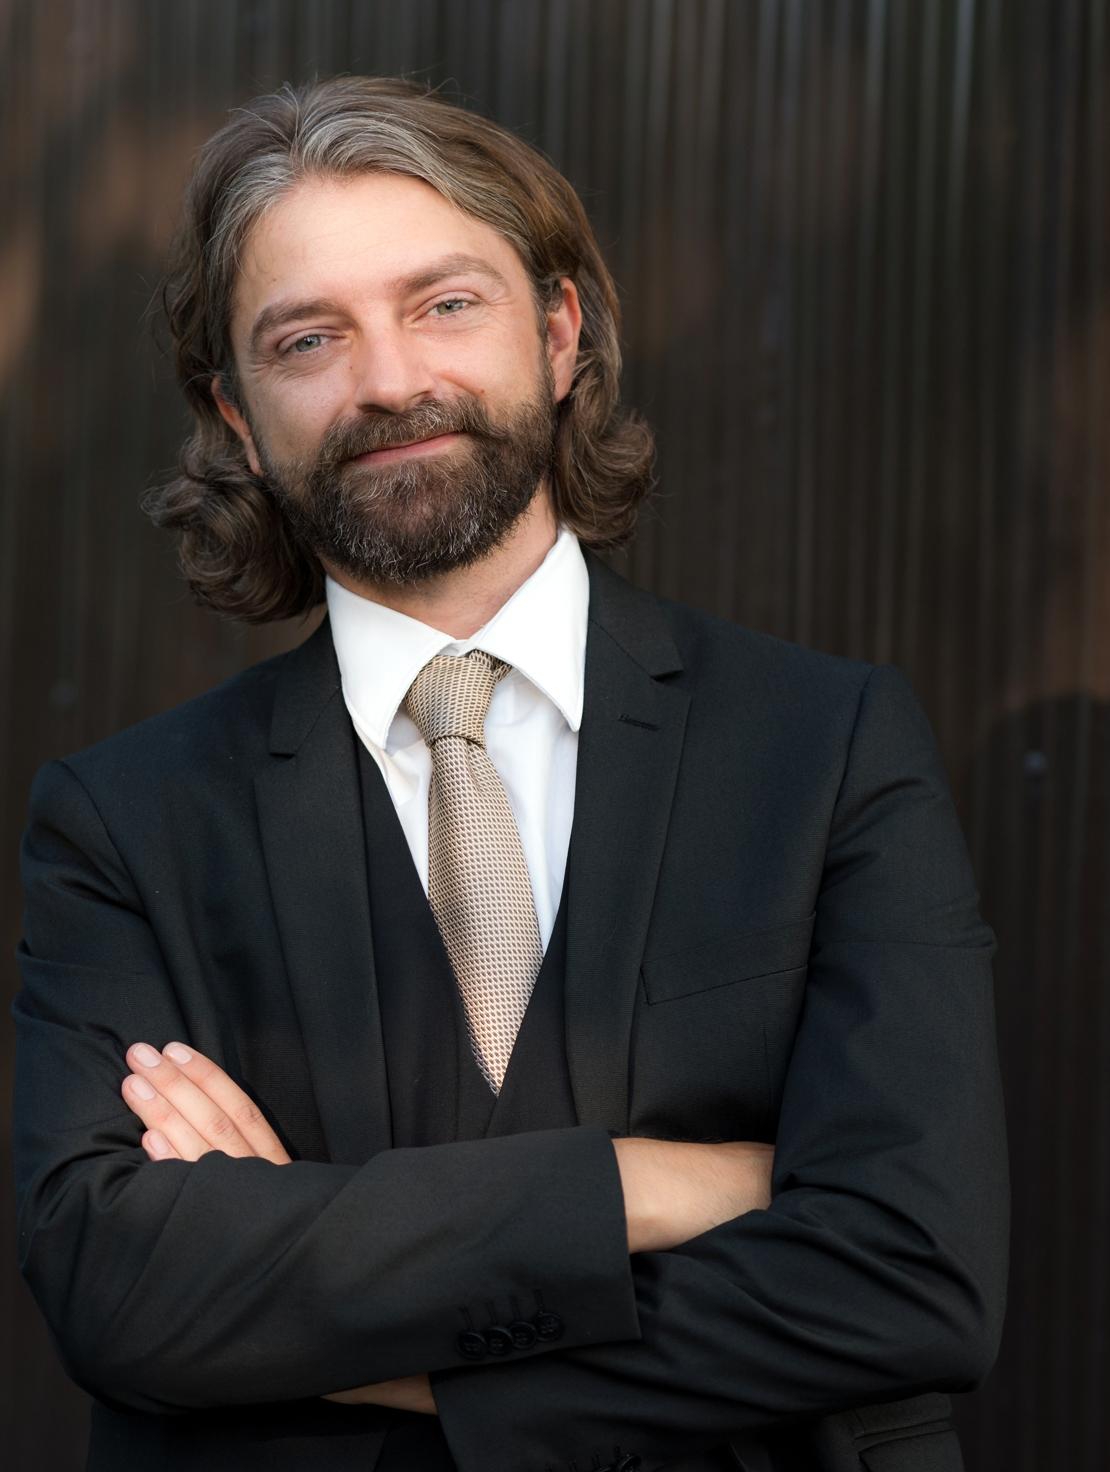 QS Mesutronic Georg Huebner komp